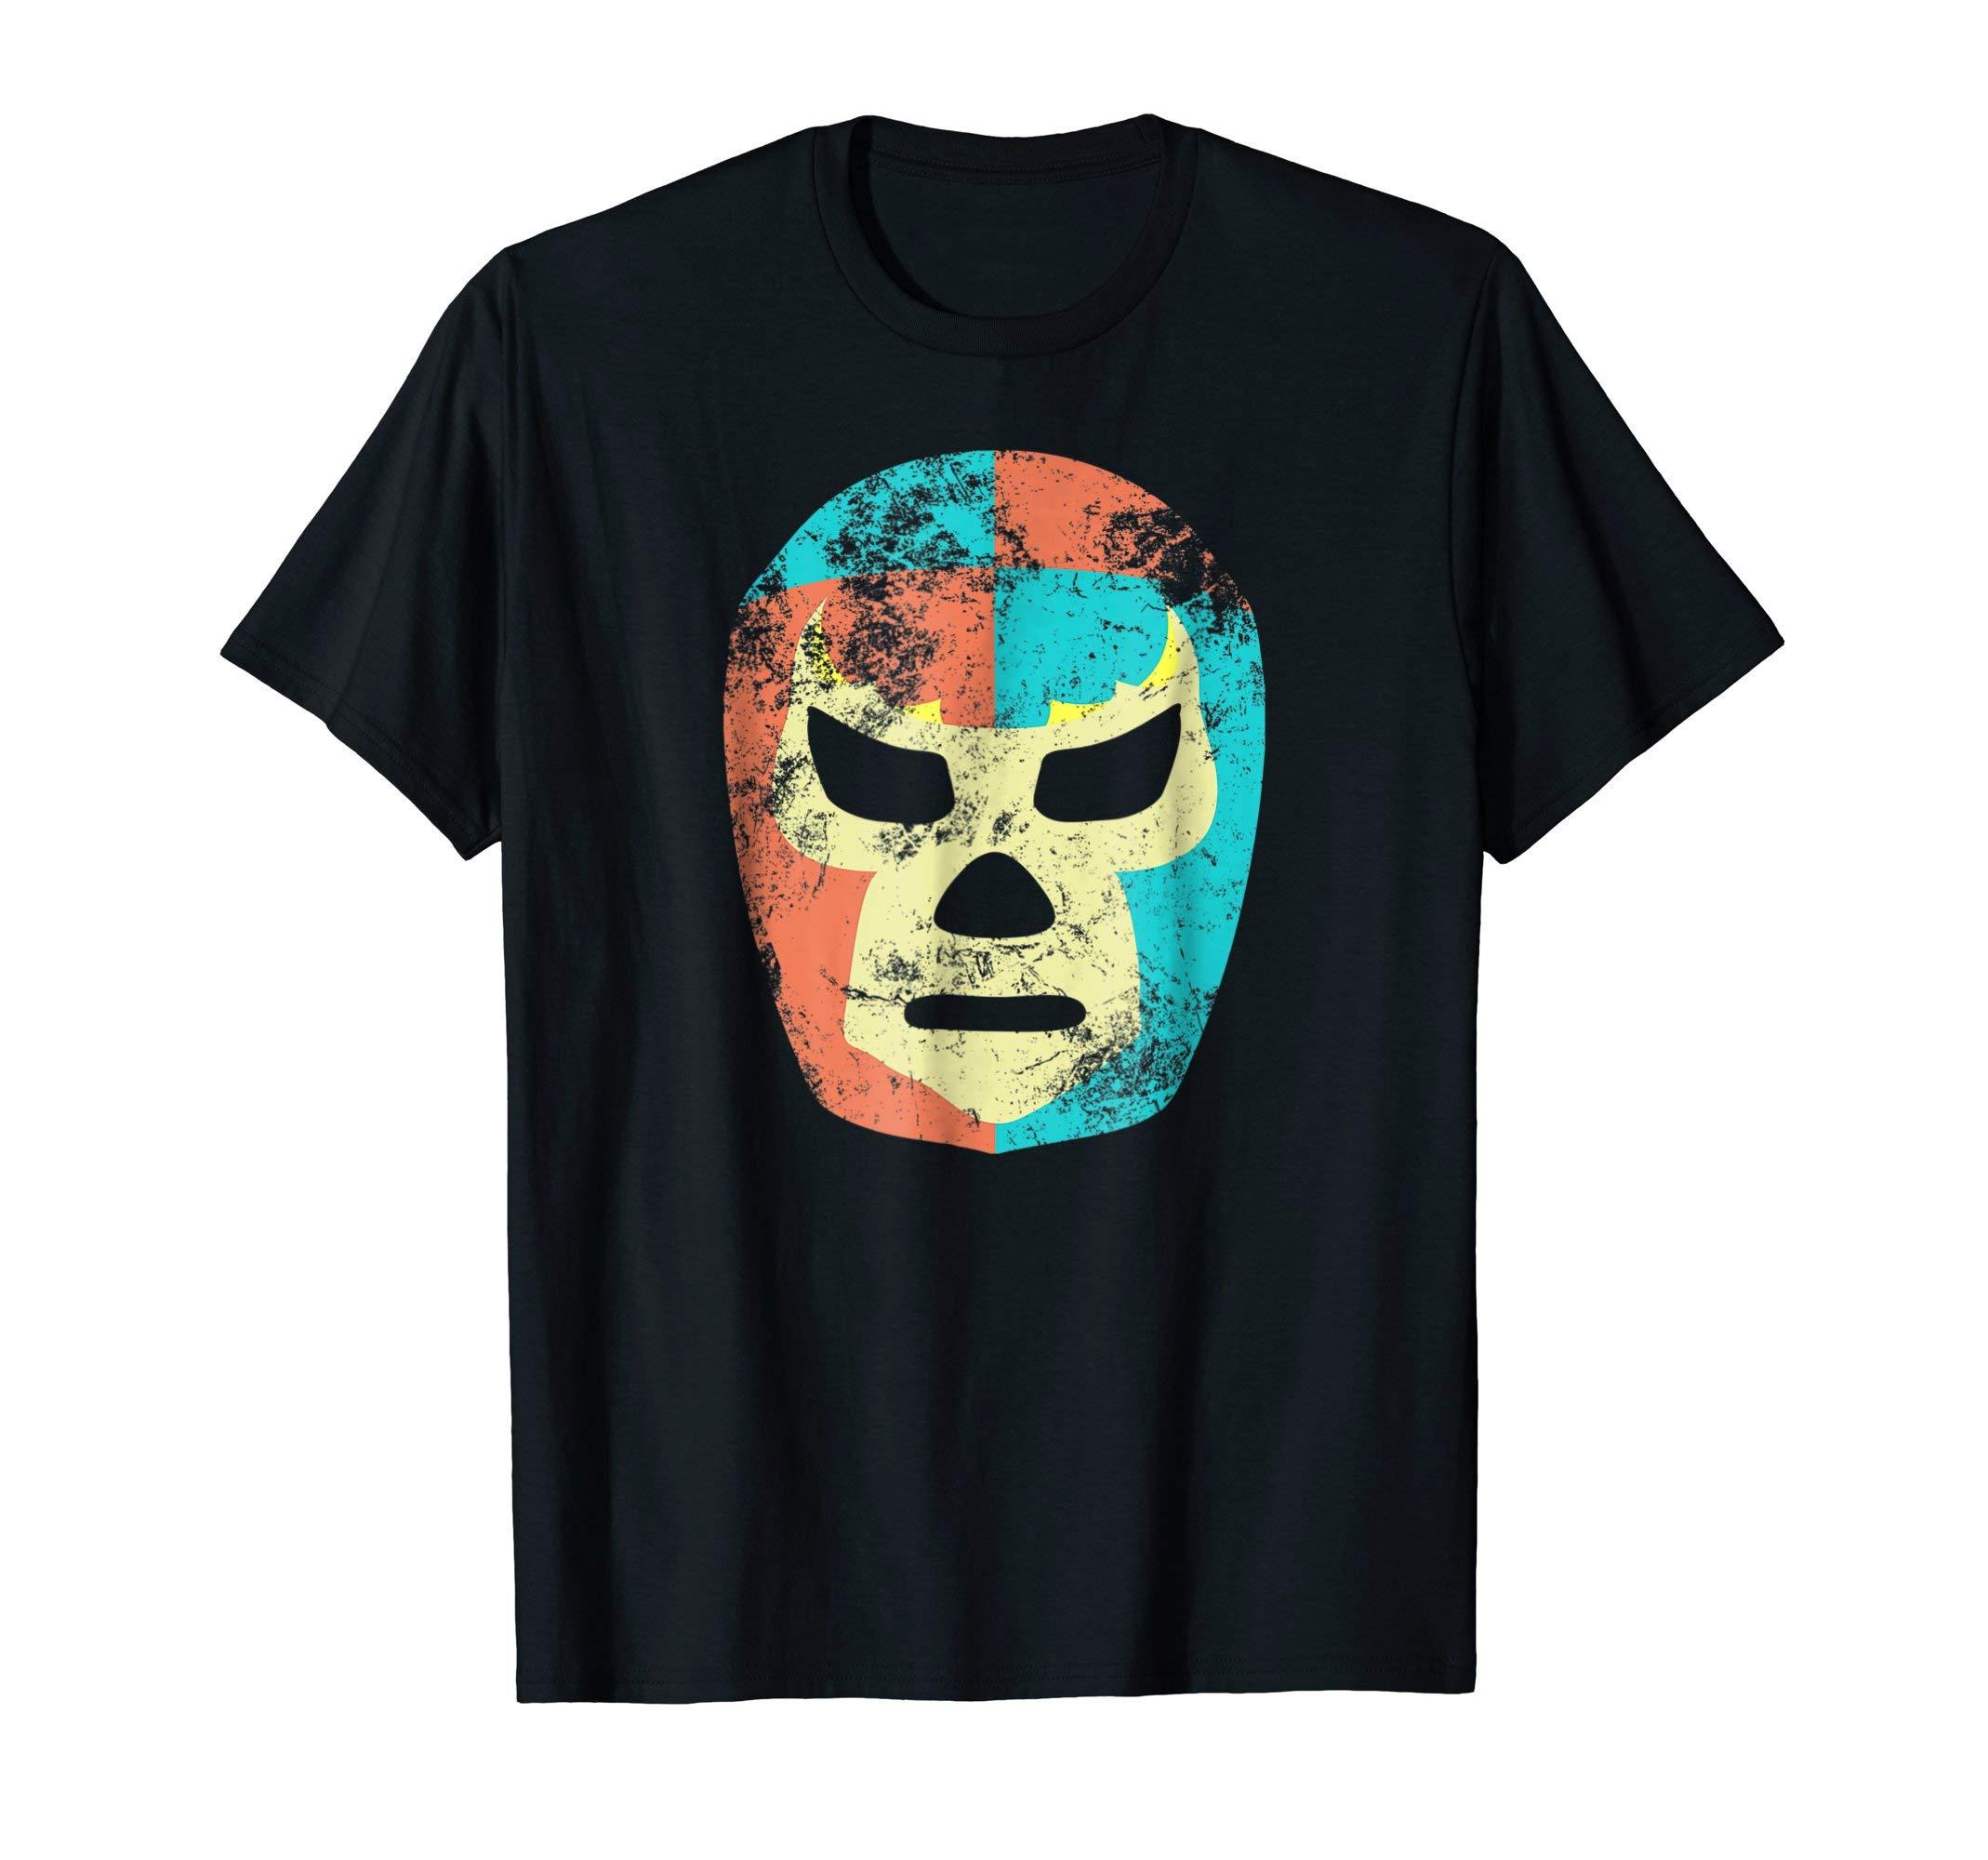 Retro Wrestling Mask Mexican Lucha Libre Luchador T-Shirt